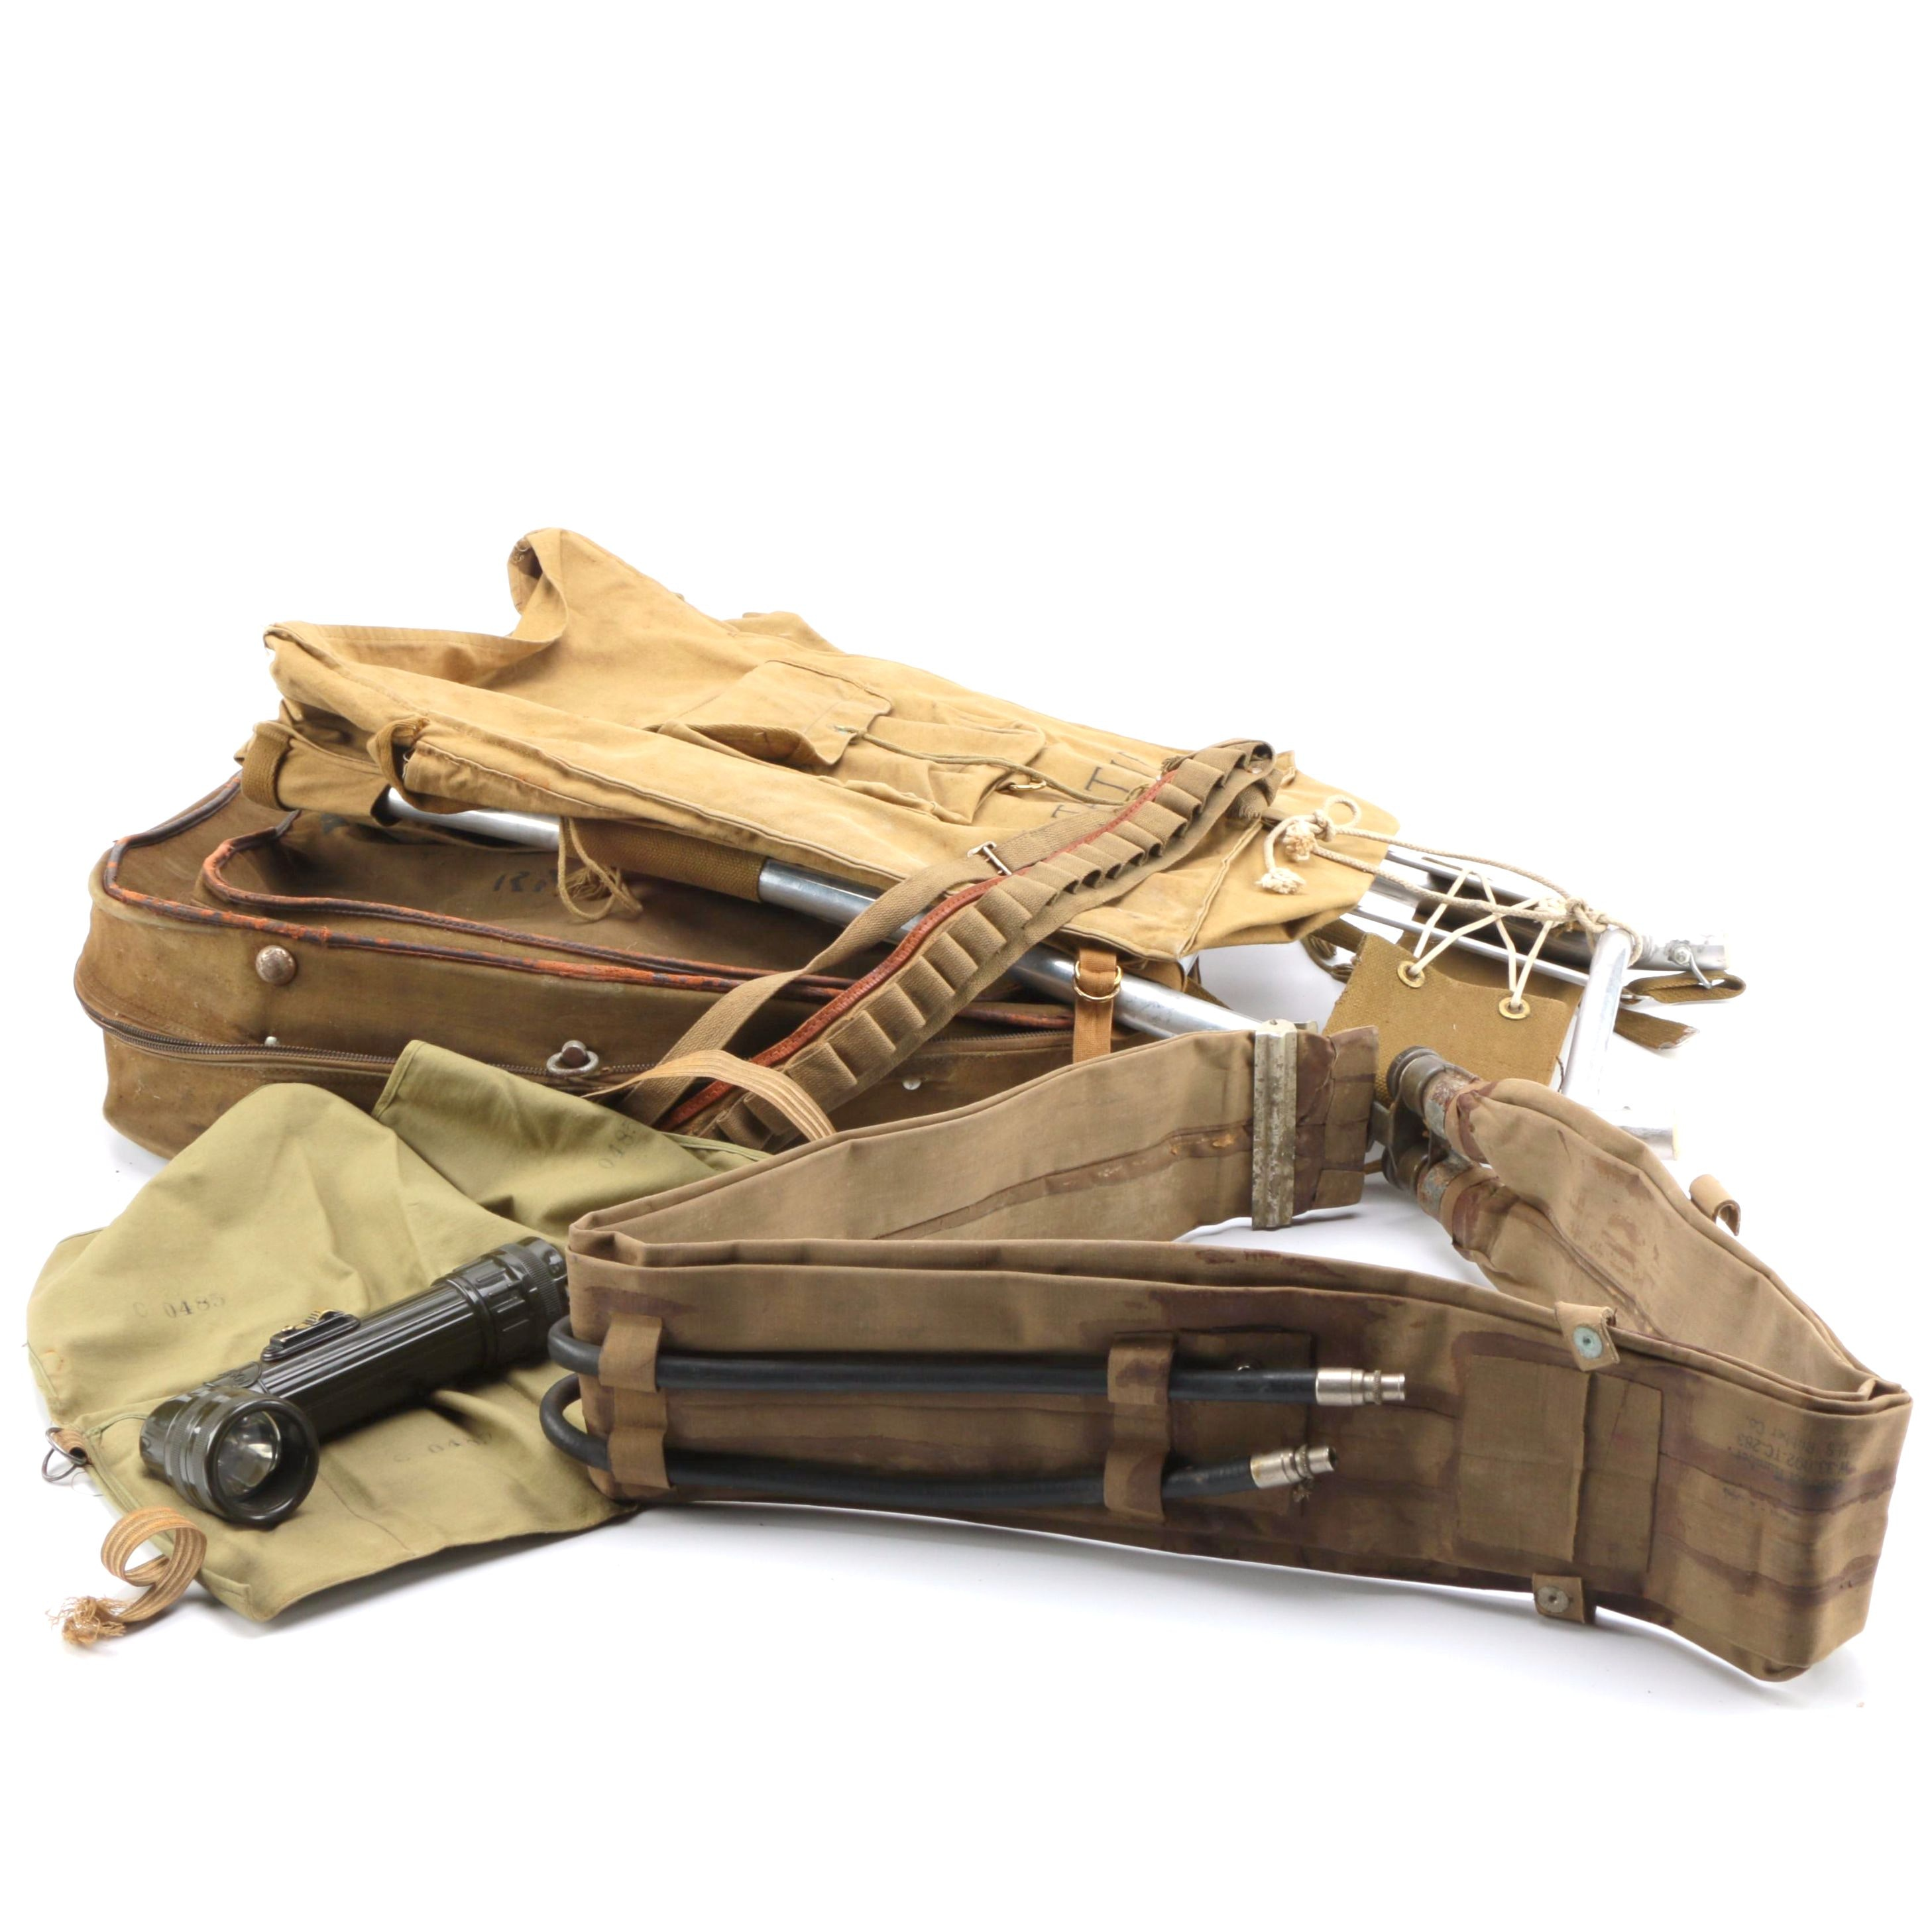 Vintage Militaria